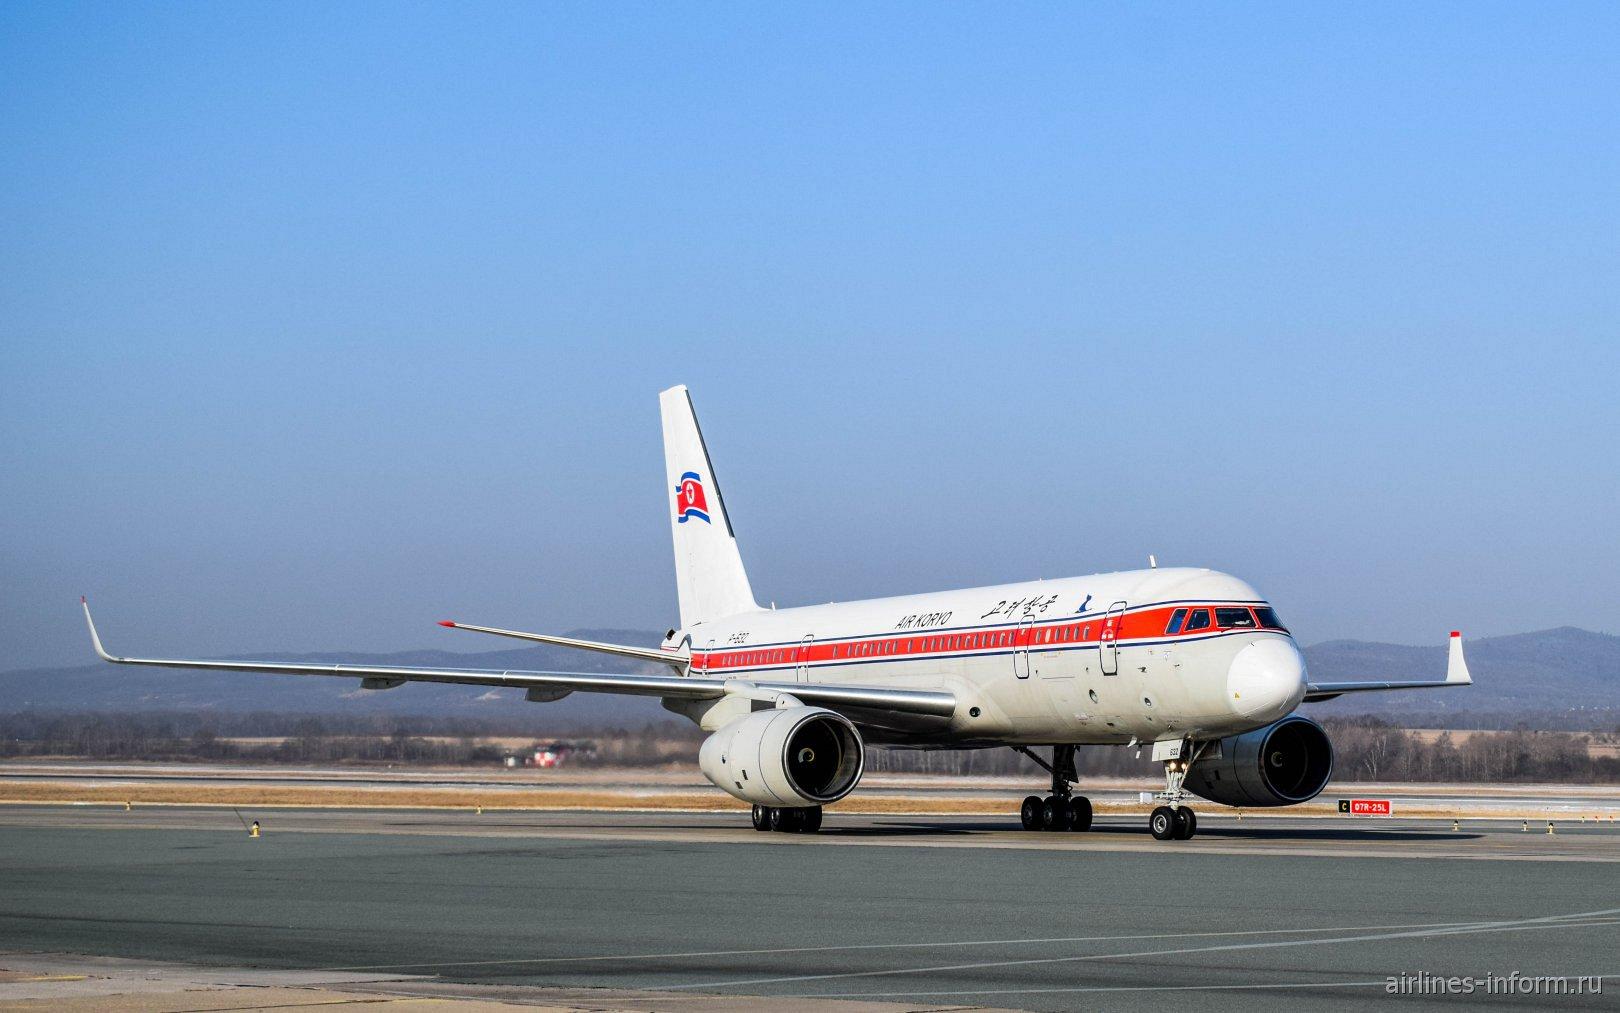 Авиалайнер Ту-204-300 авиакомпании Air Koryo в аэропорту Владивостока